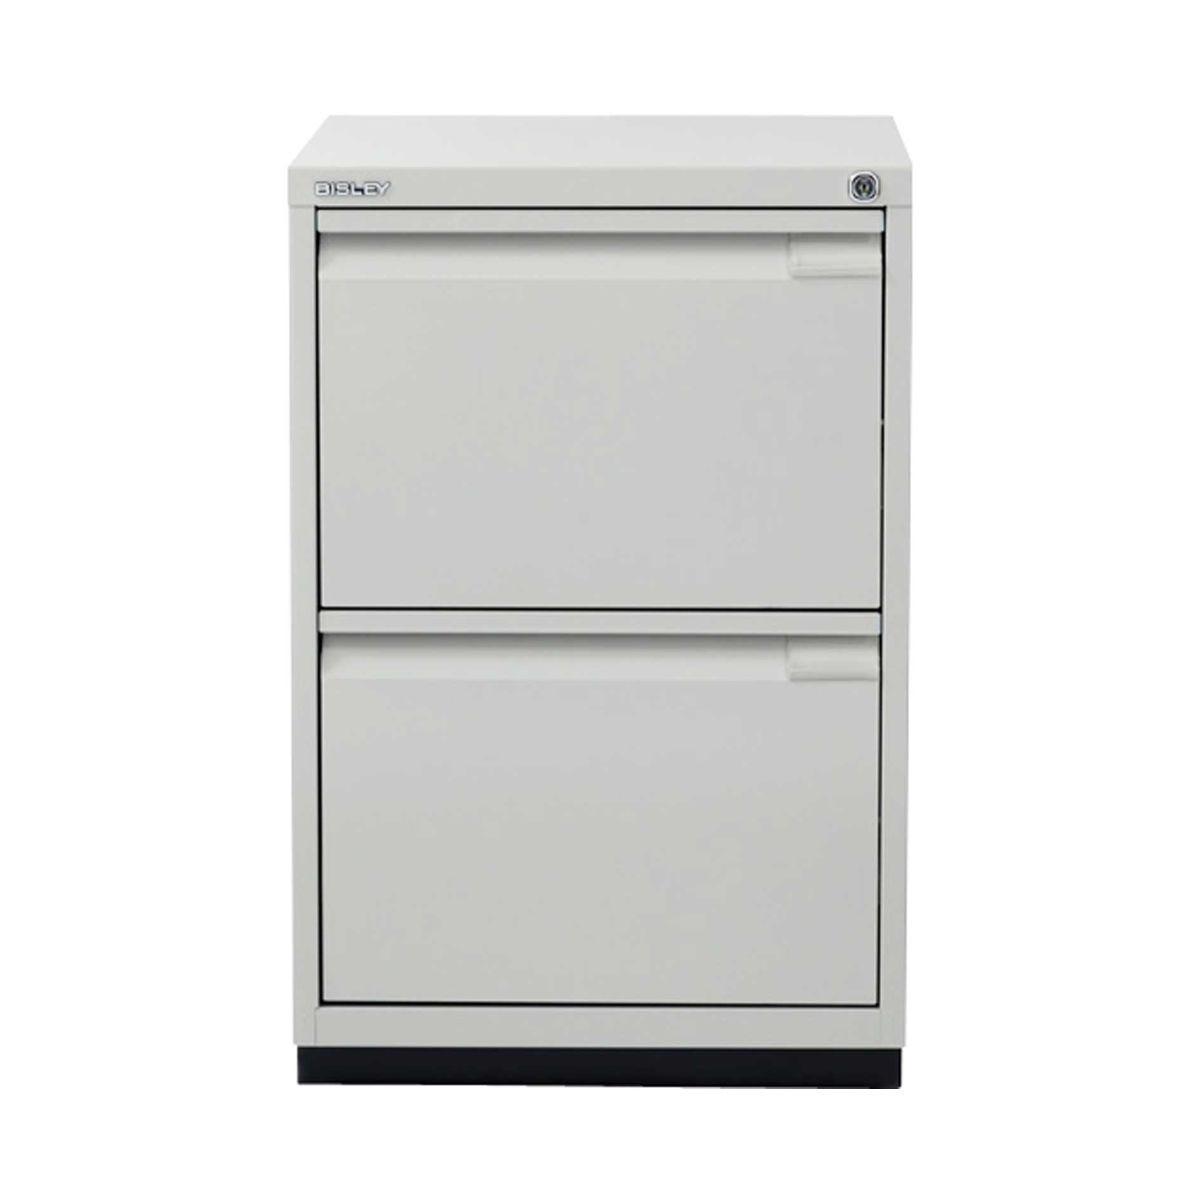 Bisley Filing Cabinet 2FE 2 Drawer H711xD470xW470mm Steel, Grey